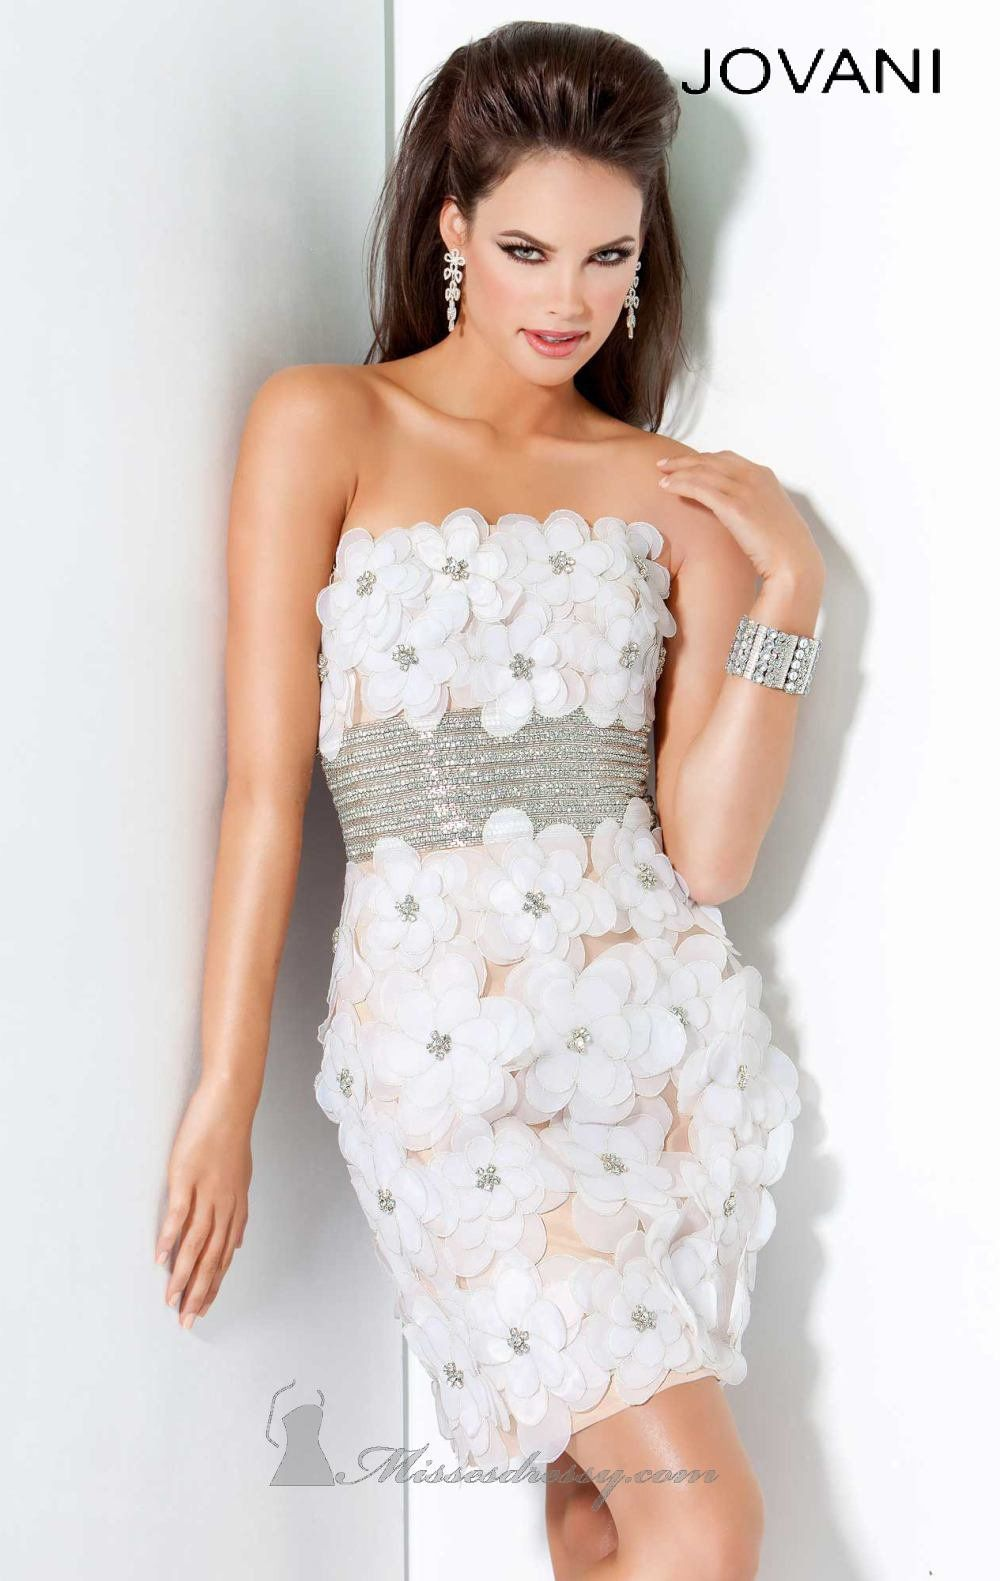 Jovani 3650 Dress - MissesDressy.com